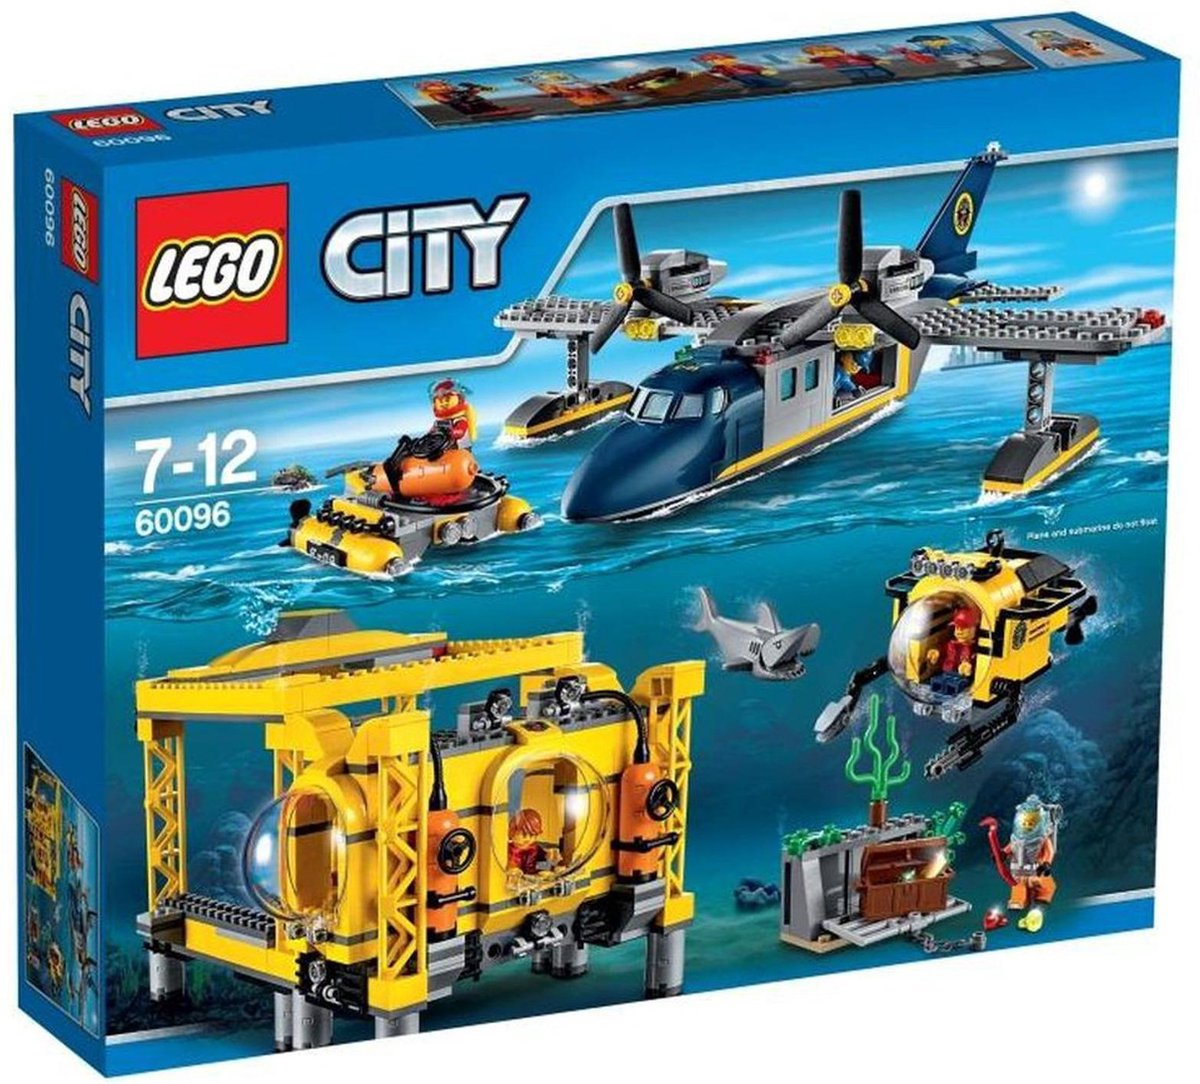 LEGO City Diepzee Station - 60096 - LEGO